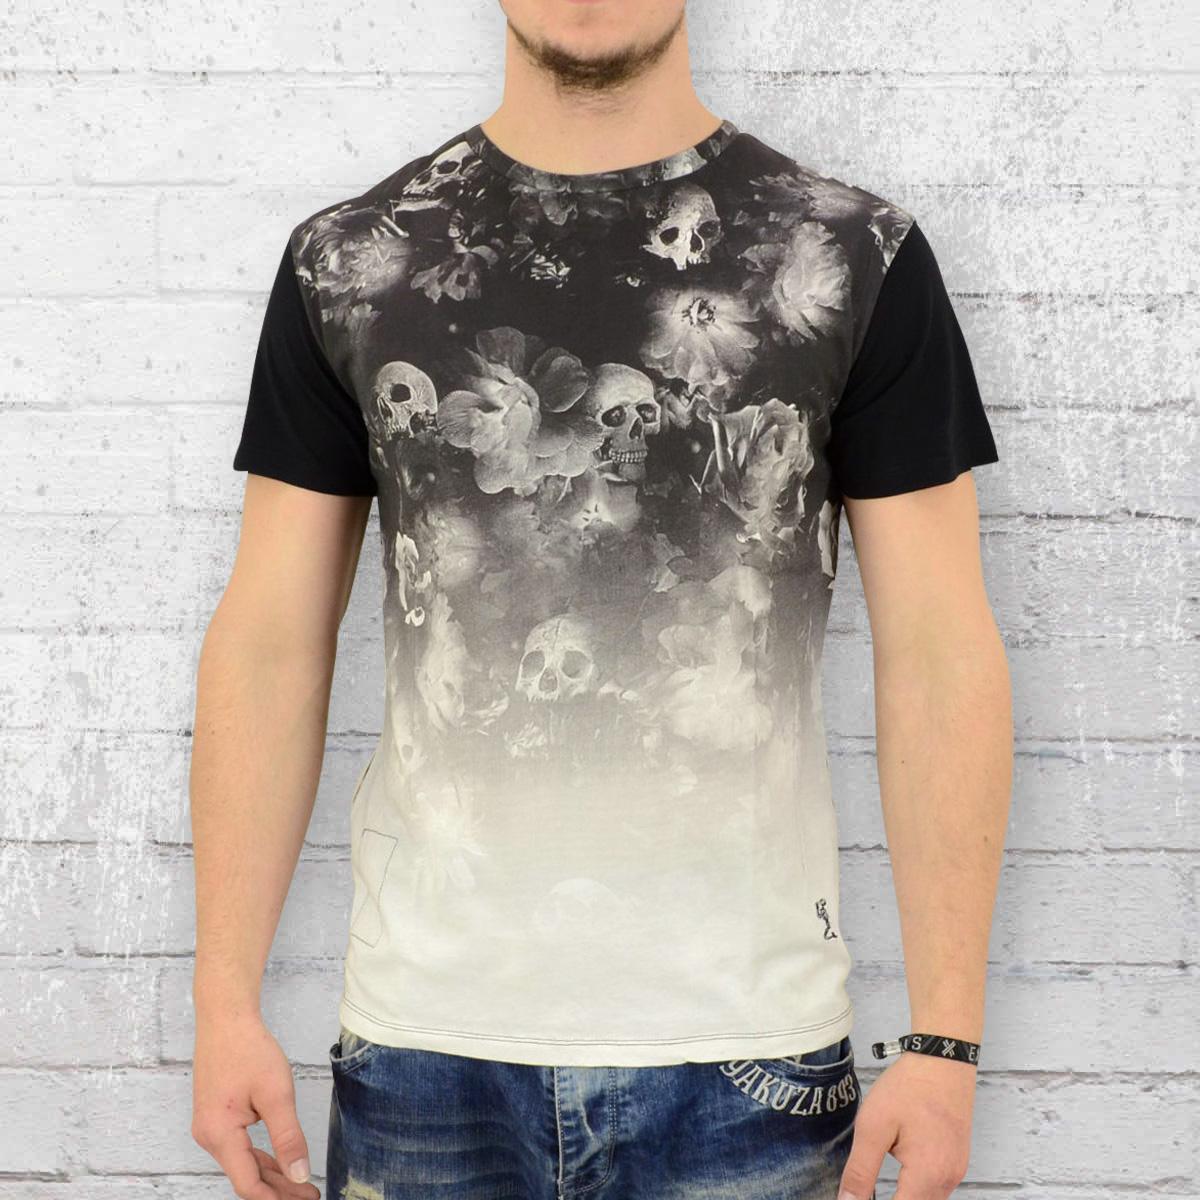 Religion Männer T-Shirt Blooming schwarz weiss